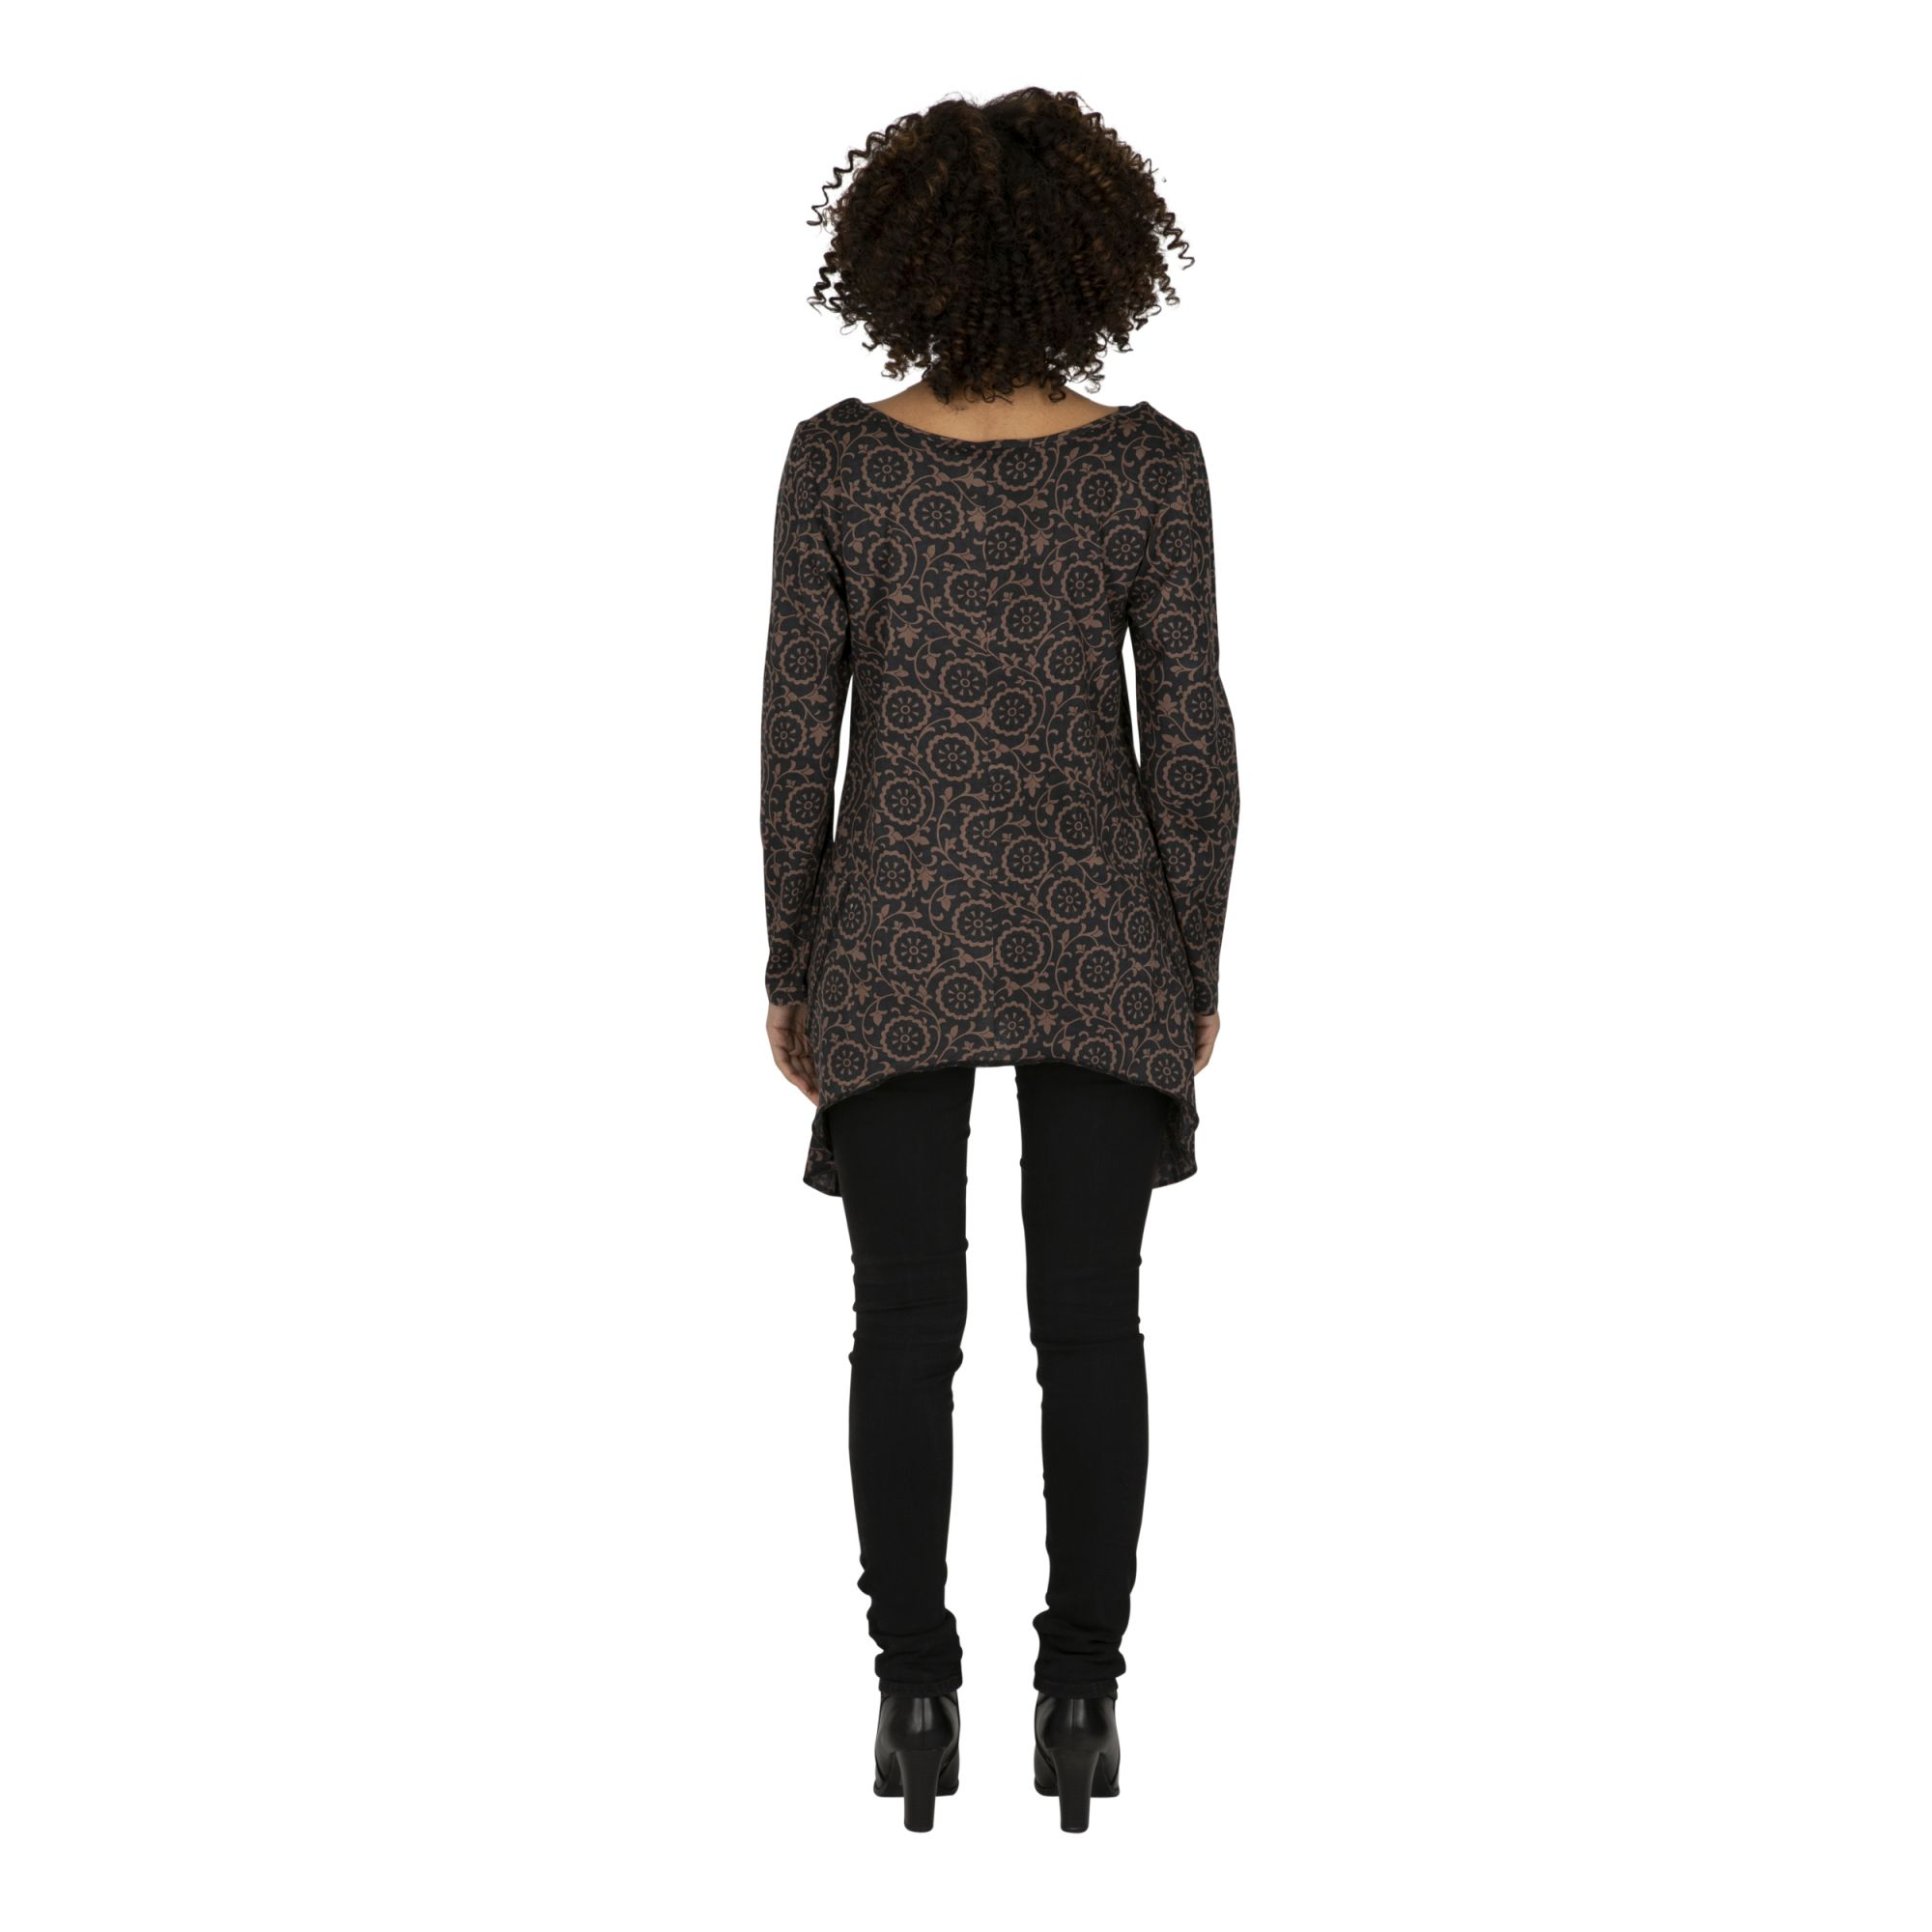 Tee-shirt femme long et ample très mode Riobamby